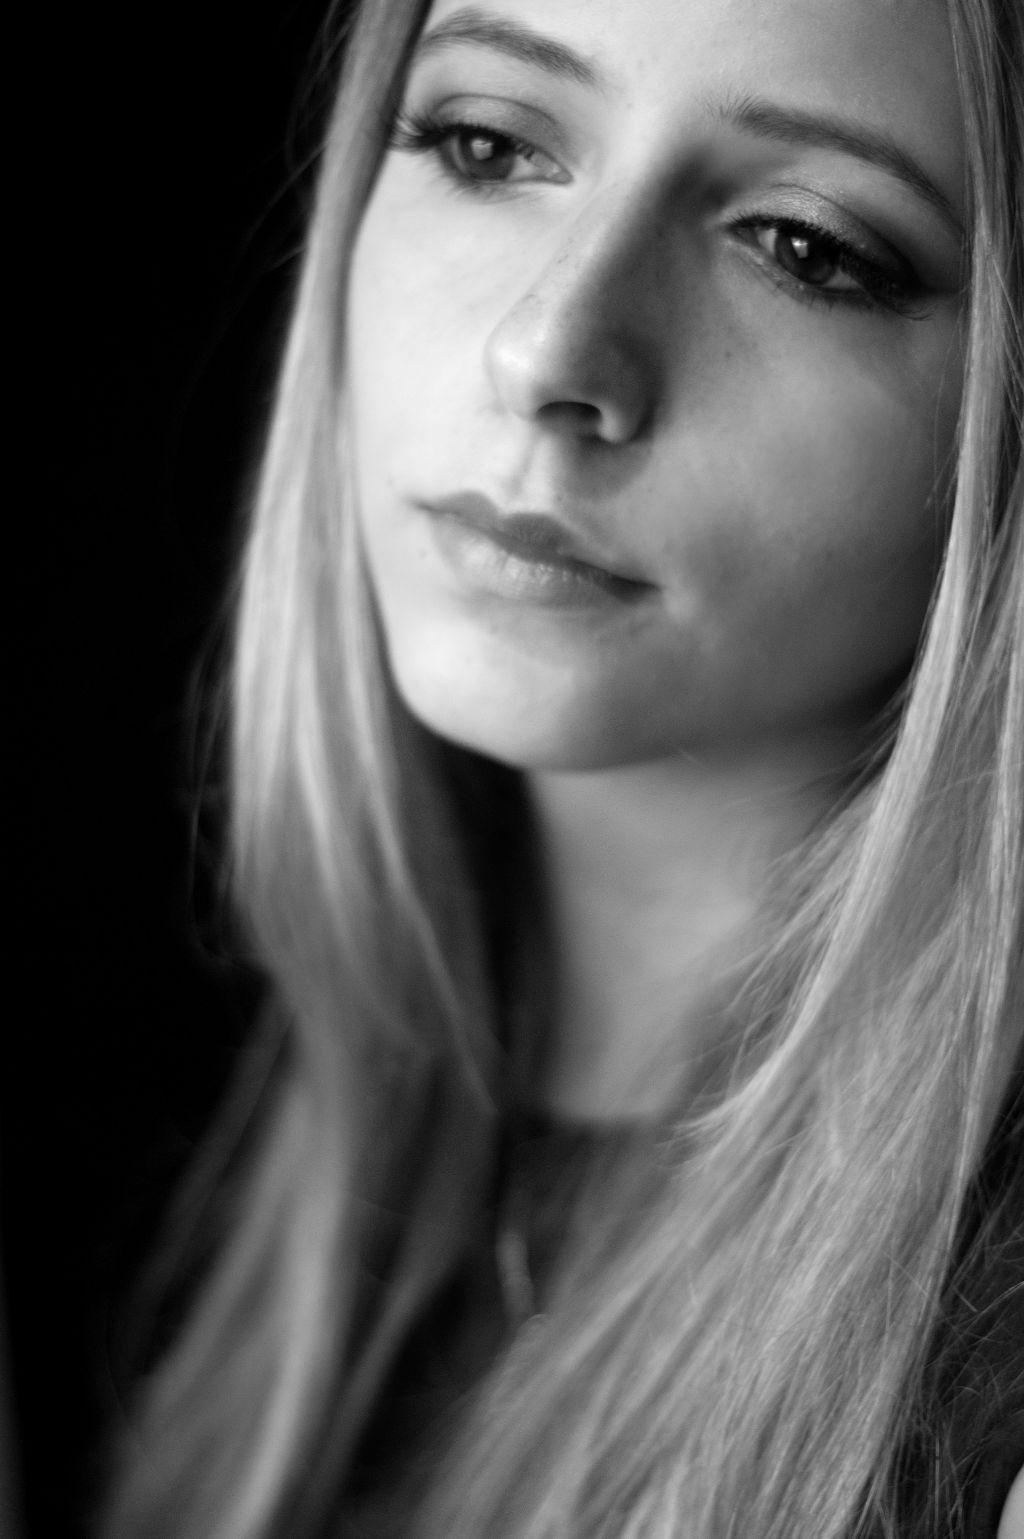 #blackandwhite #freetoedit #people #photography #summer #me #edited #makeup